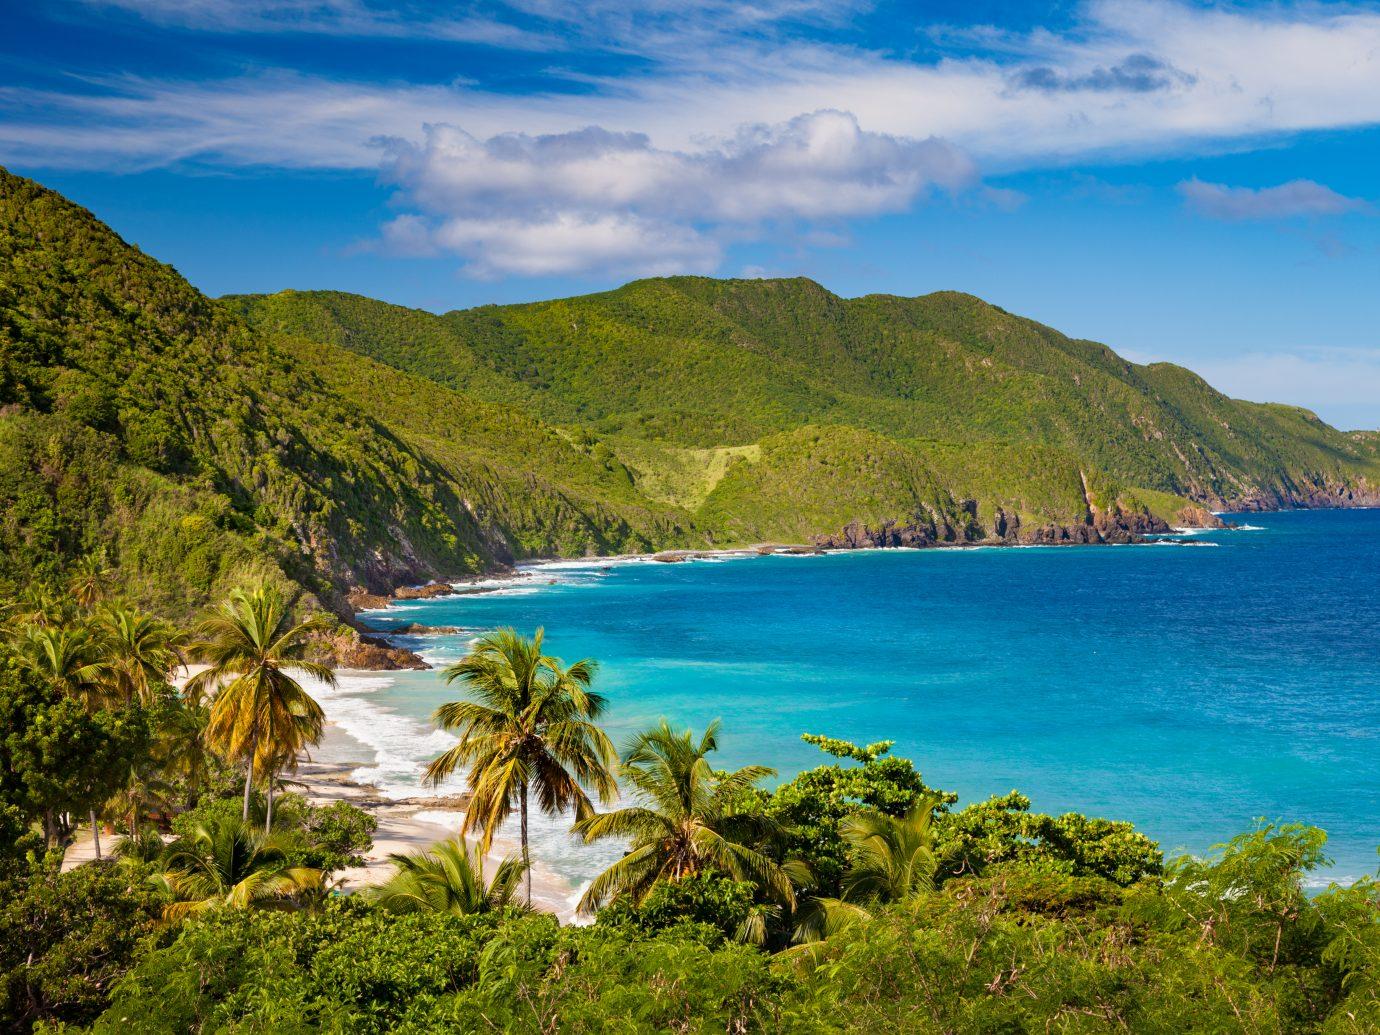 panoramic view of Carambola Beach, St.Croix, US Virgin Islands